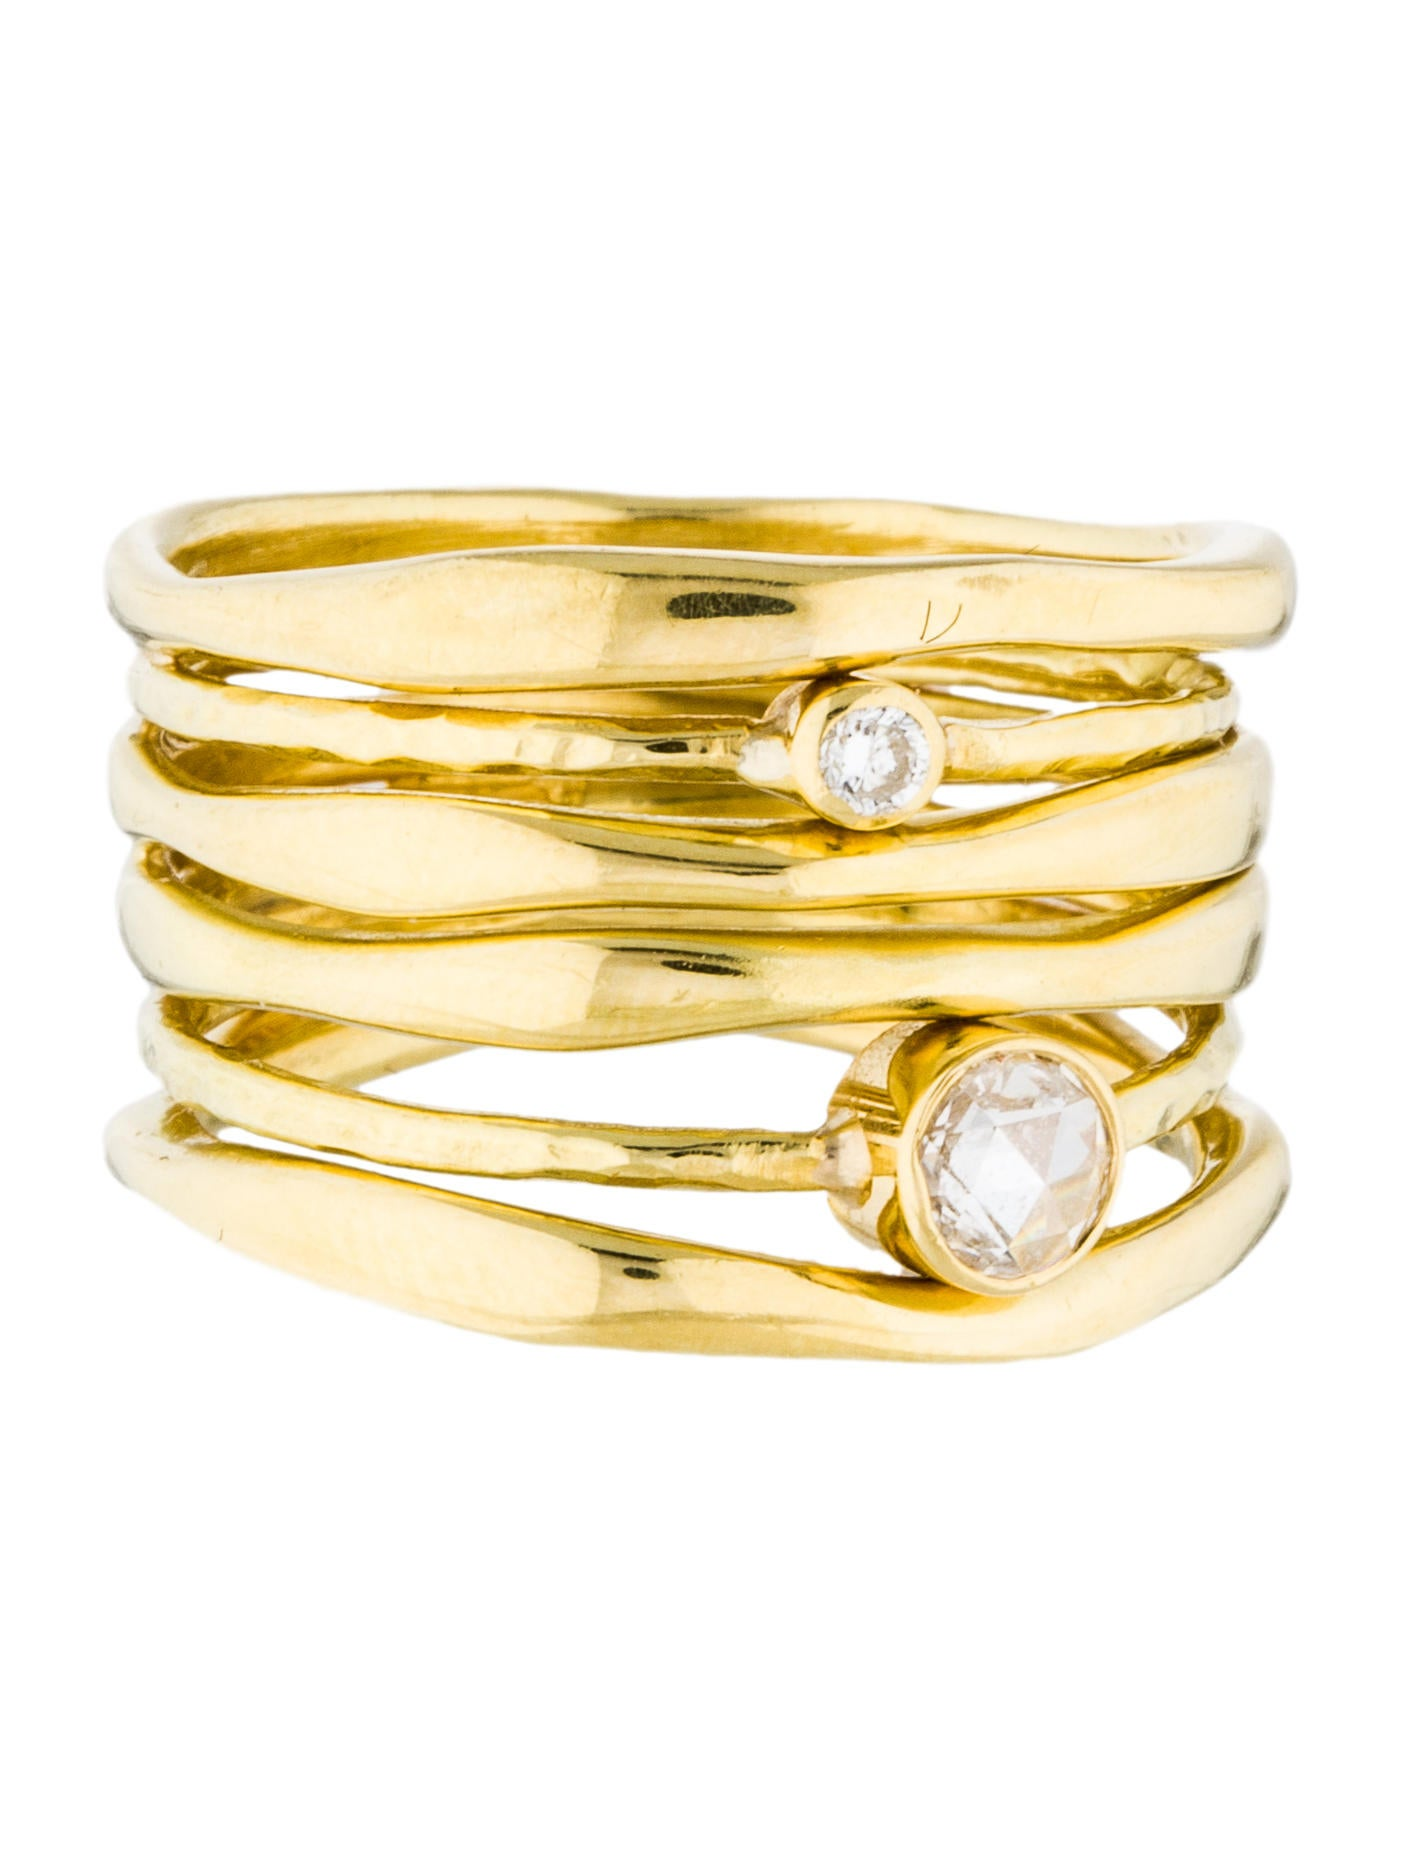 Ippolita 18k Diamond Movie Star Ring  Rings  Ipp26811. Futuristic Wedding Rings. Circle Cut Wedding Rings. Orca Rings. Stone Wedding Rings. Painter Rings. Secret World Wedding Rings. Gemstone Rings. Jewelry Rings